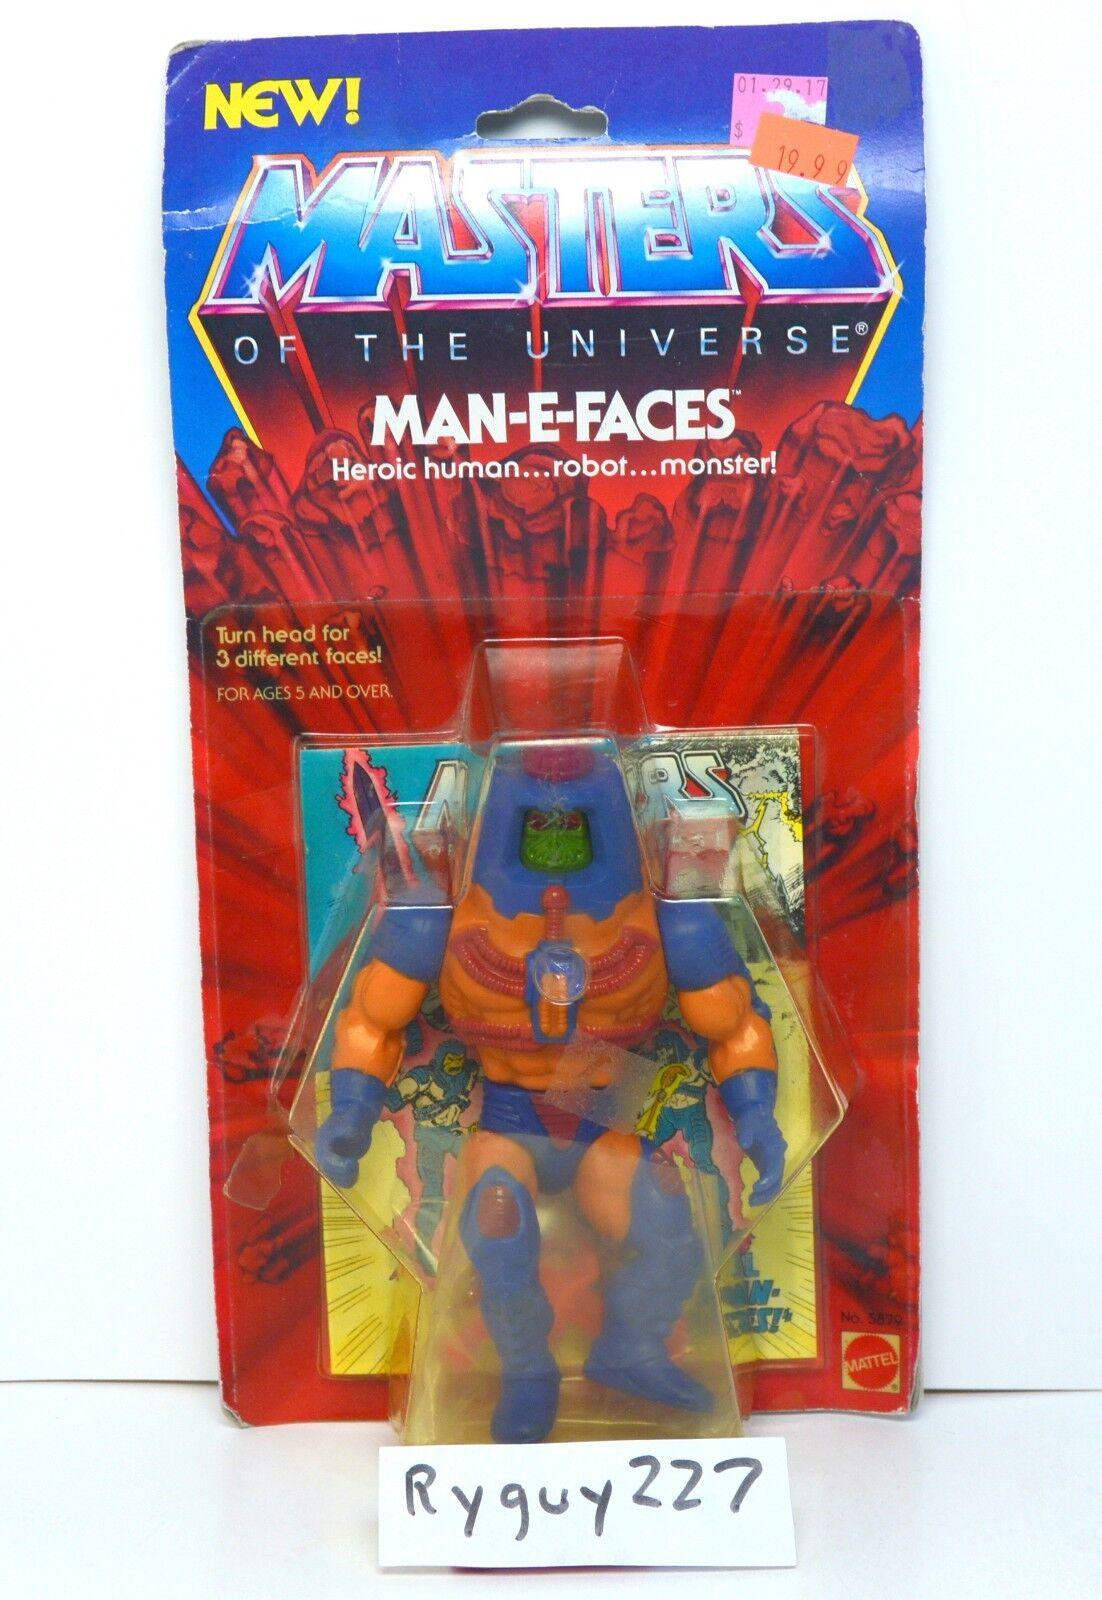 MOTU, Man-E-Faces, Masters of the Universe, MOC, carded, figure, sealed, He Man